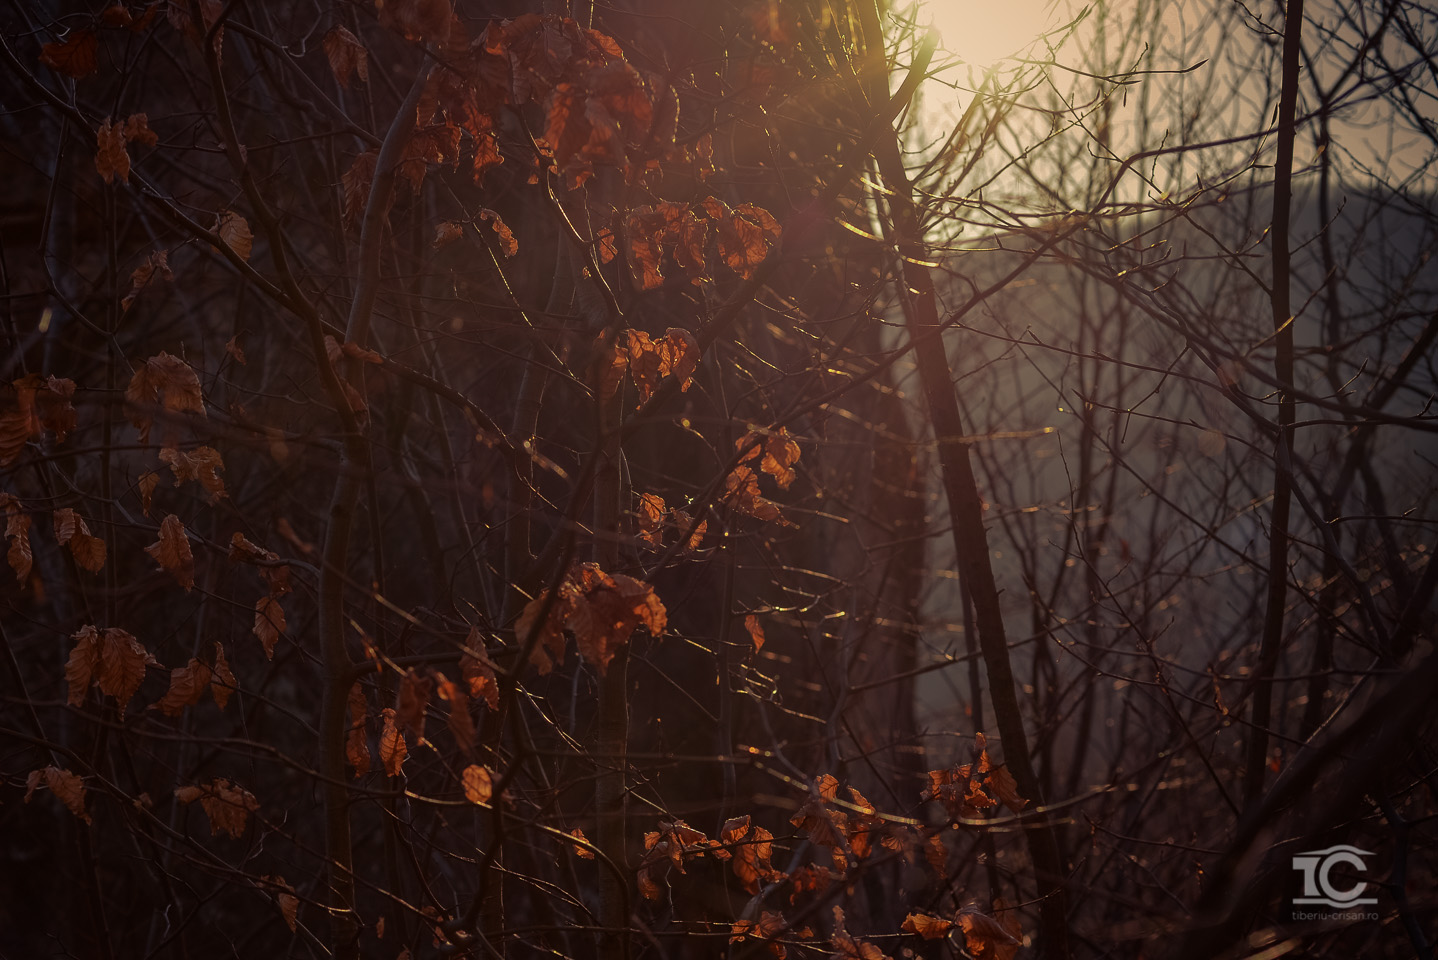 gradina-zmeilor-02-2015-018